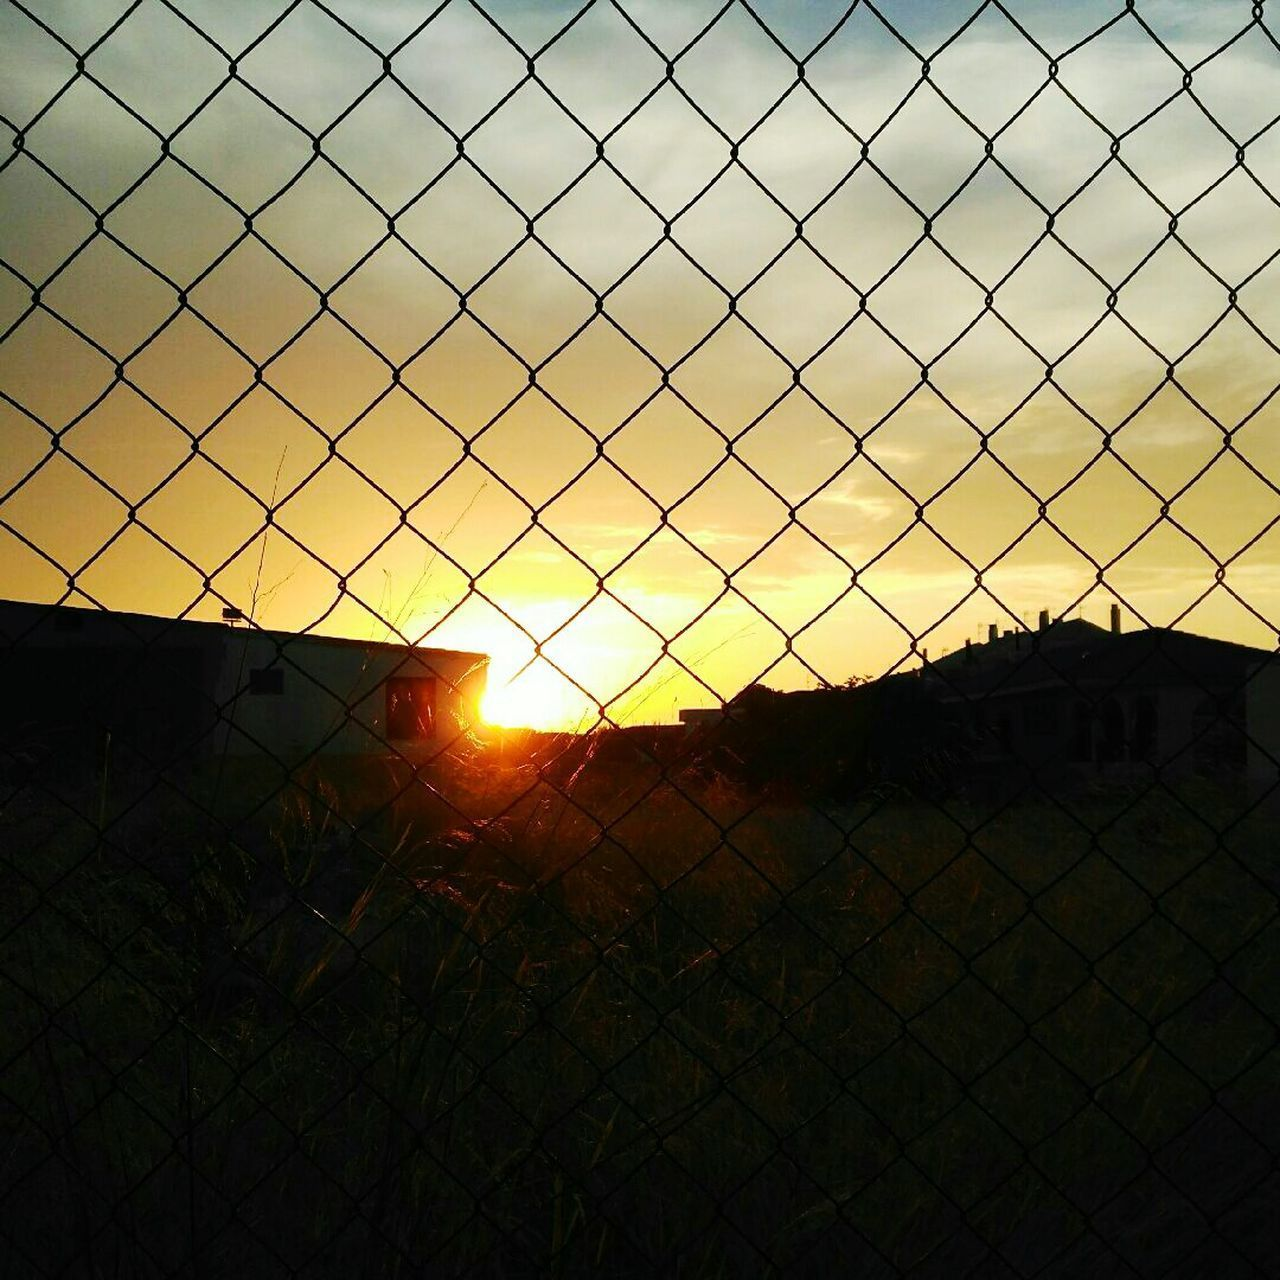 Sunset Protection Security Fence Safety Chainlink Fence Sunset Tranquil Scene Landscape Tranquility Silhouette Solitude Sky Sun Idyllic Calm Scenics Remote Dark Outline Atardecer Pueblos De España Village Life